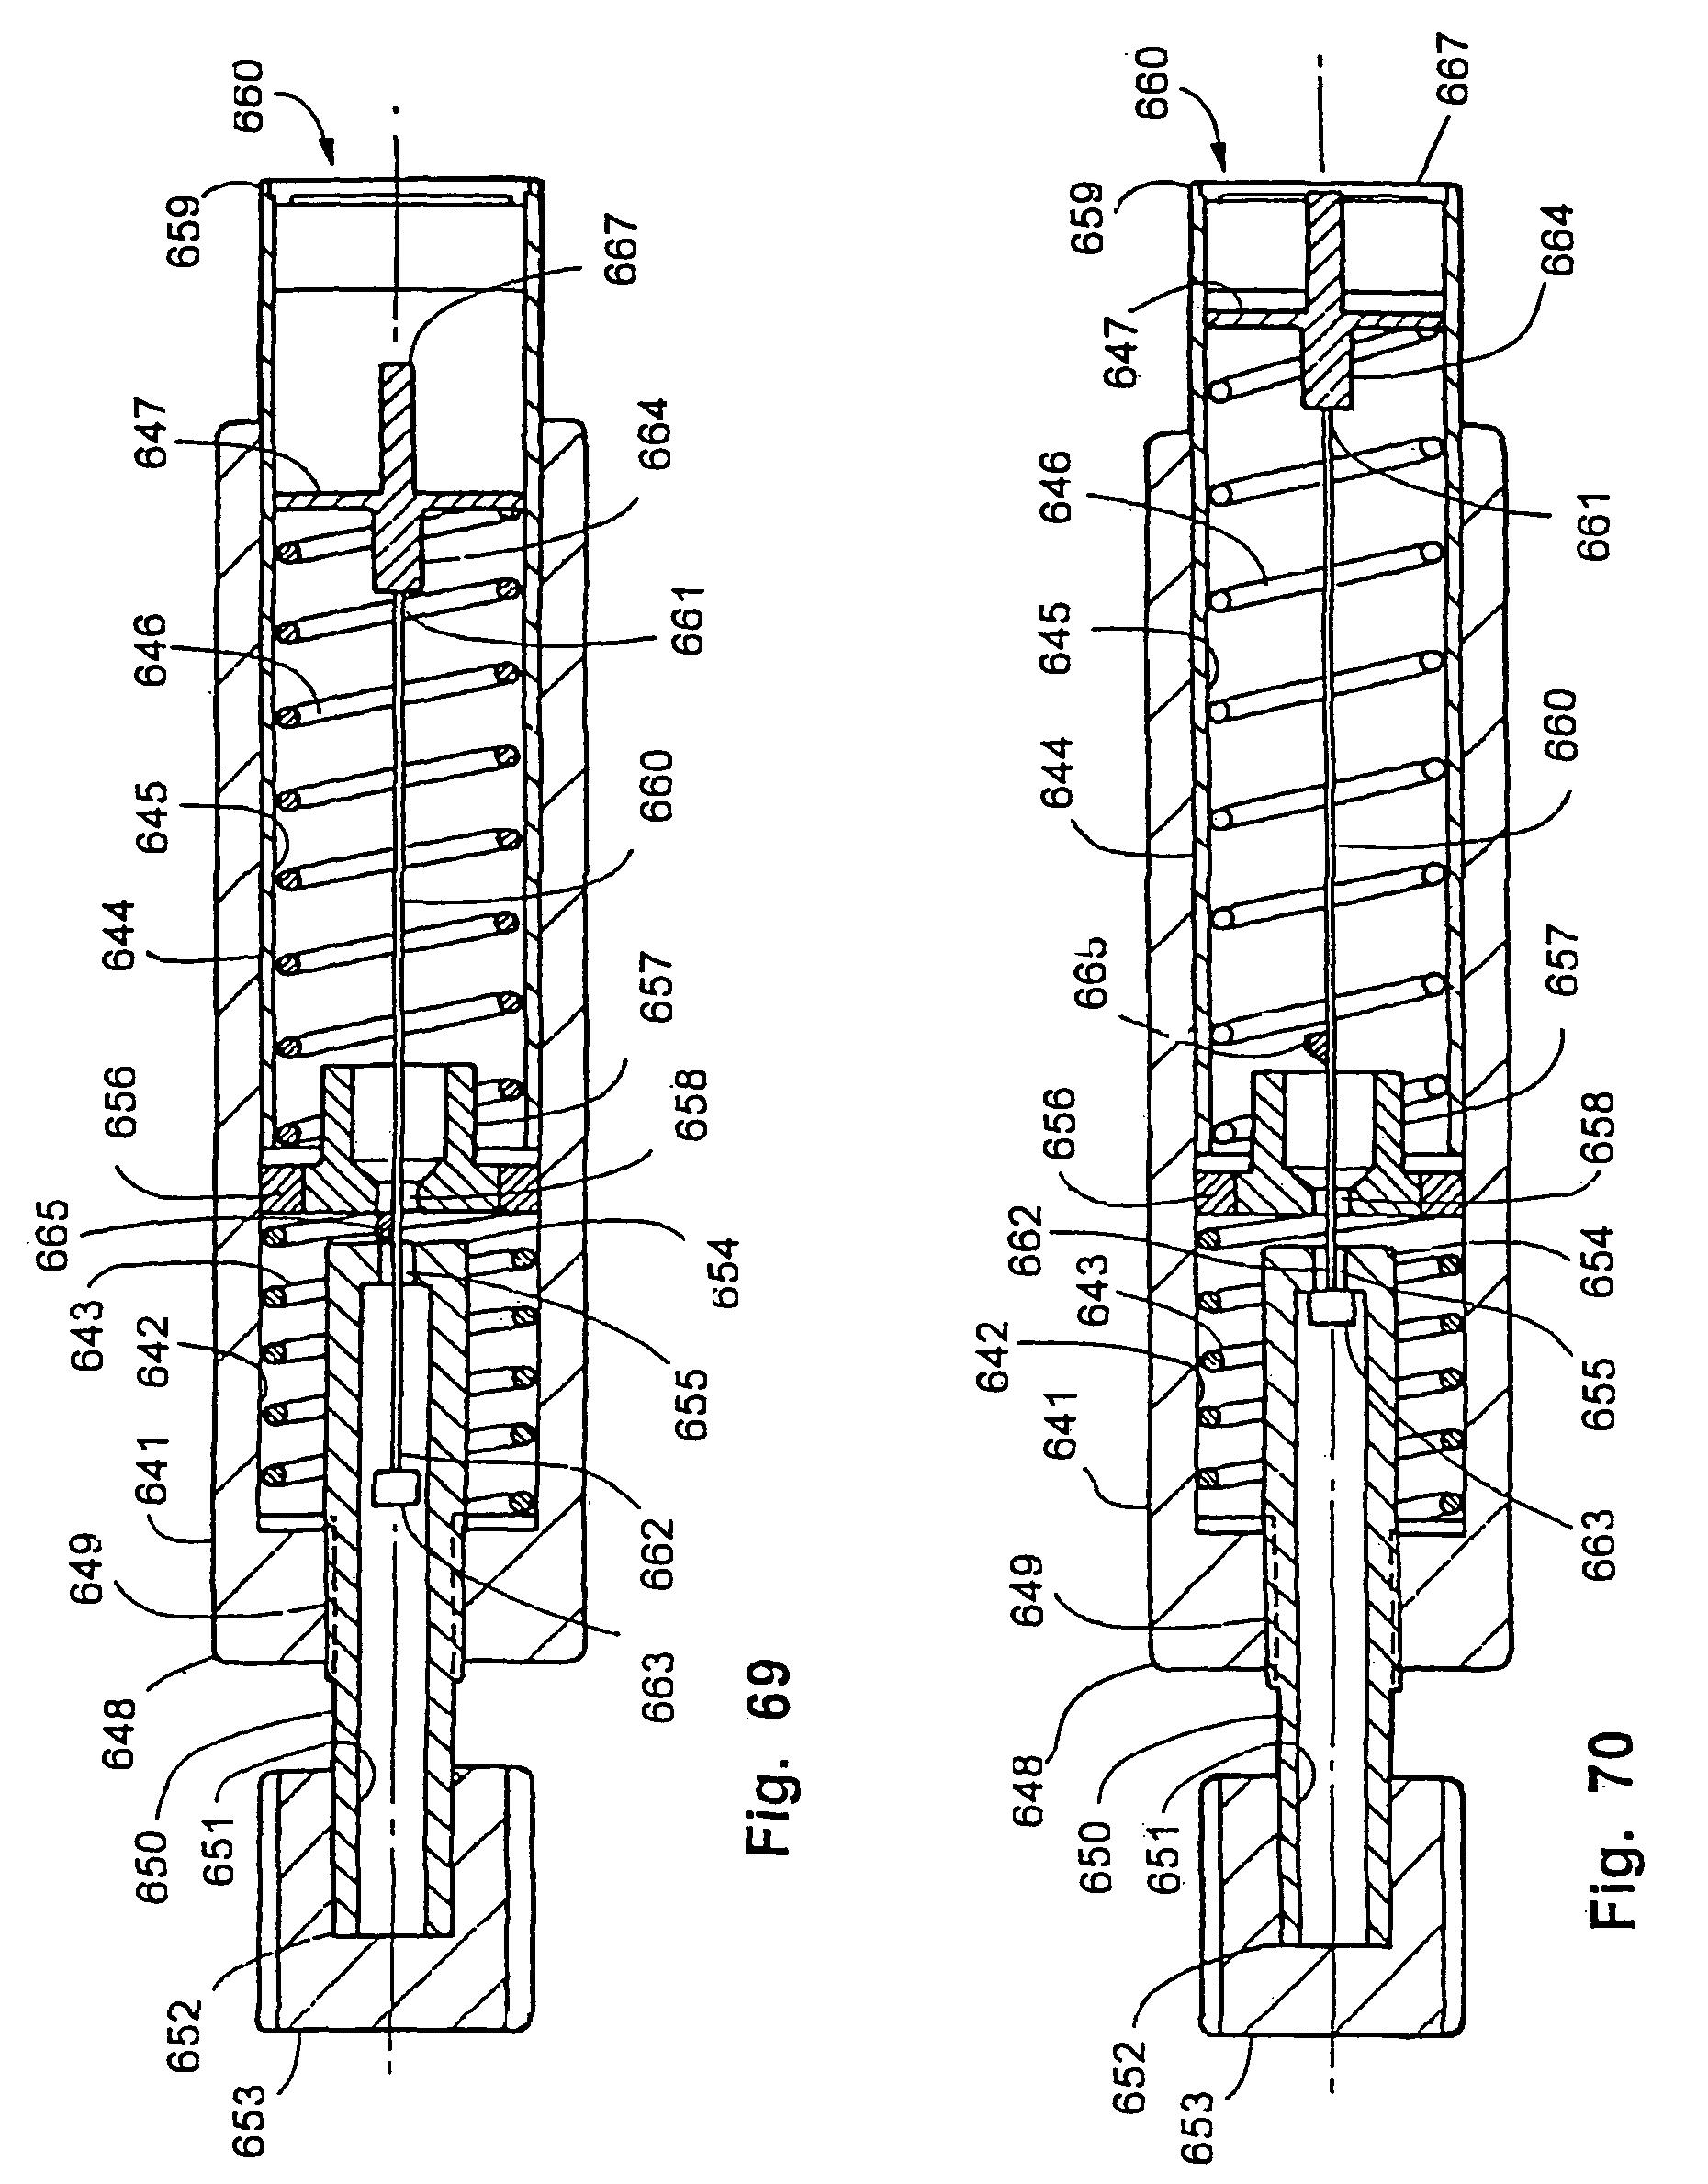 US7981055B2 - Tissue penetration device - Google Patents